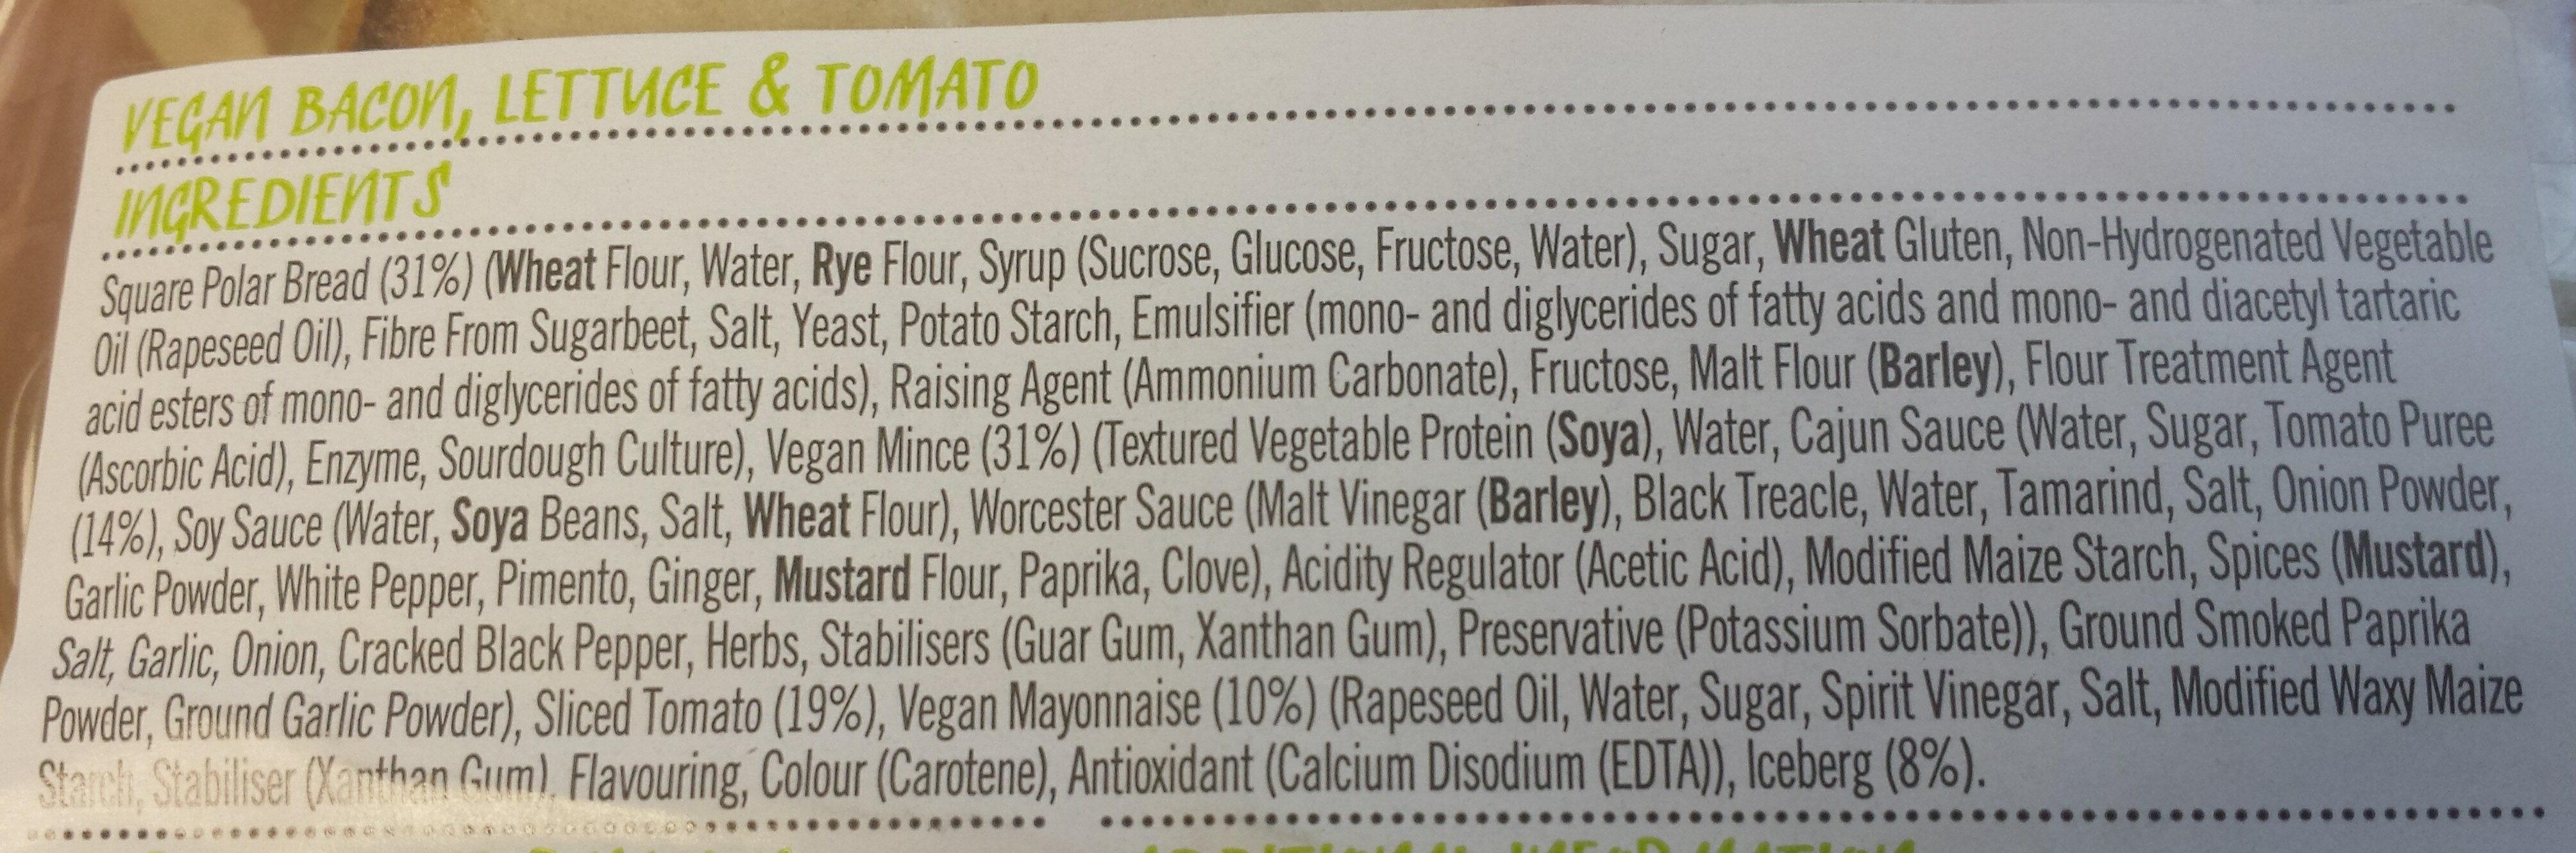 The VLT - Vegan Bacon, lettuce and tomato - Ingredients